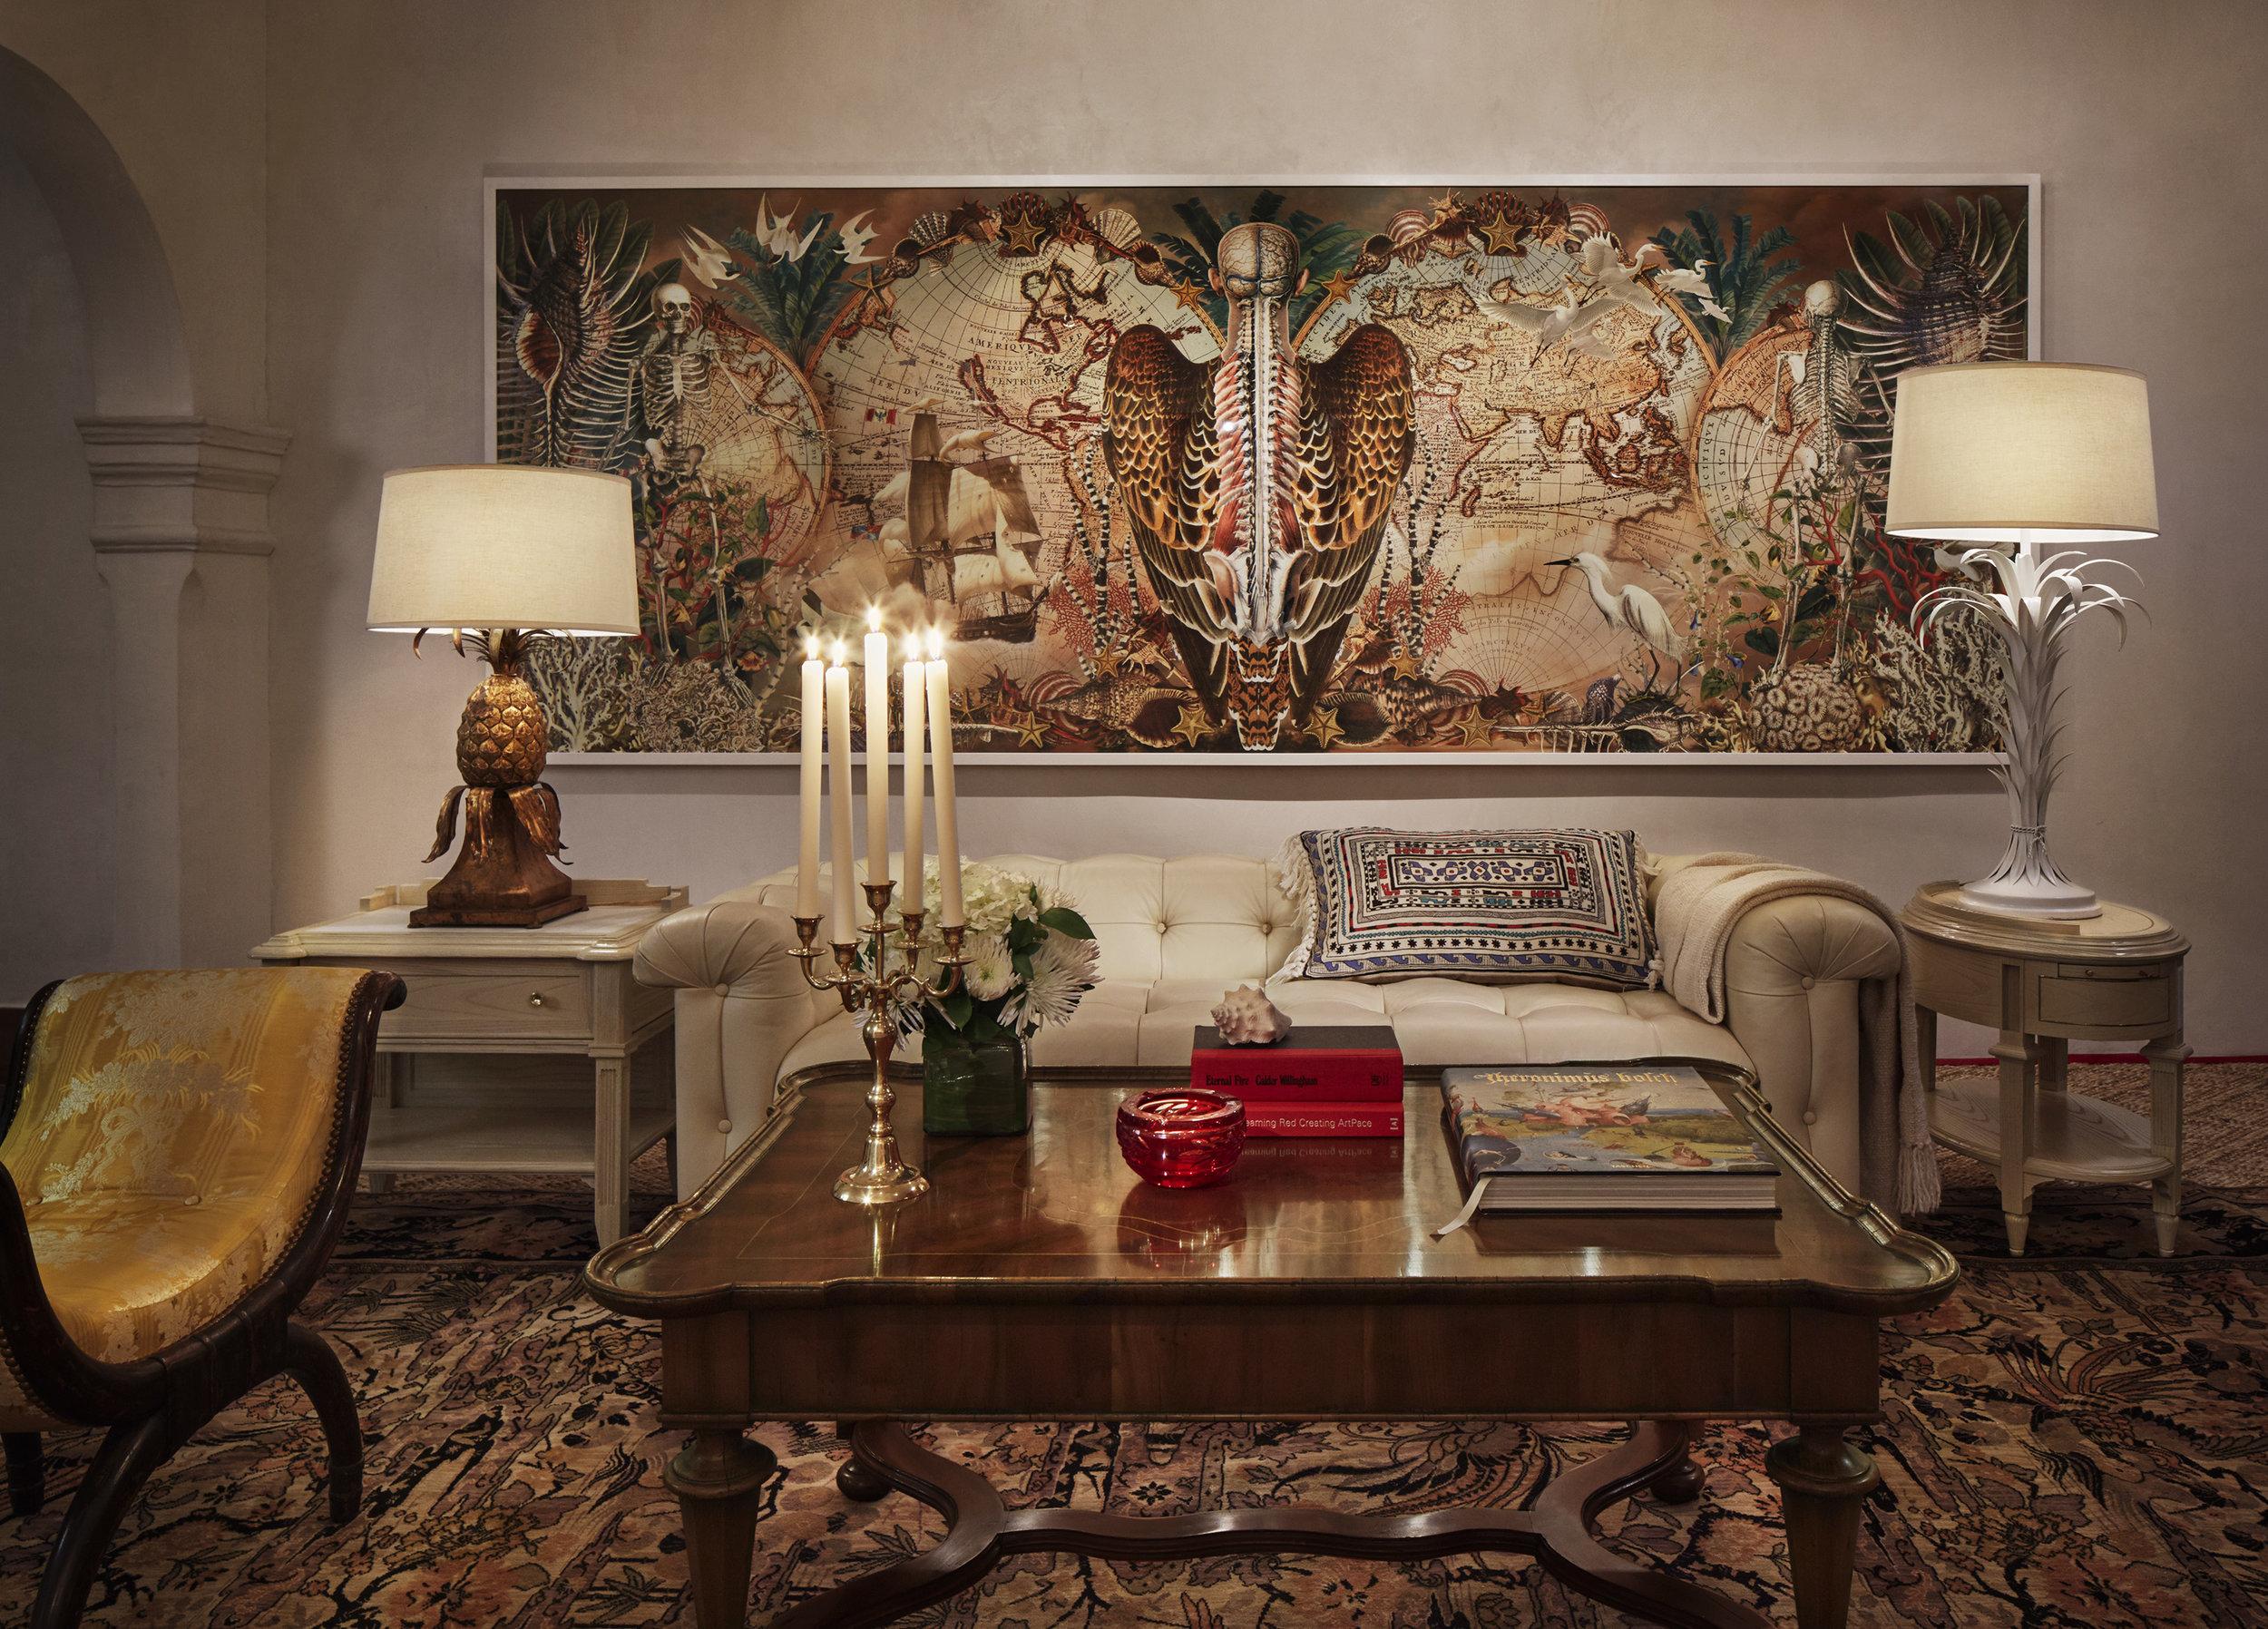 Casa Claridges_Atrium Art by Juan Gatti_Credit Nik Koenig.jpg